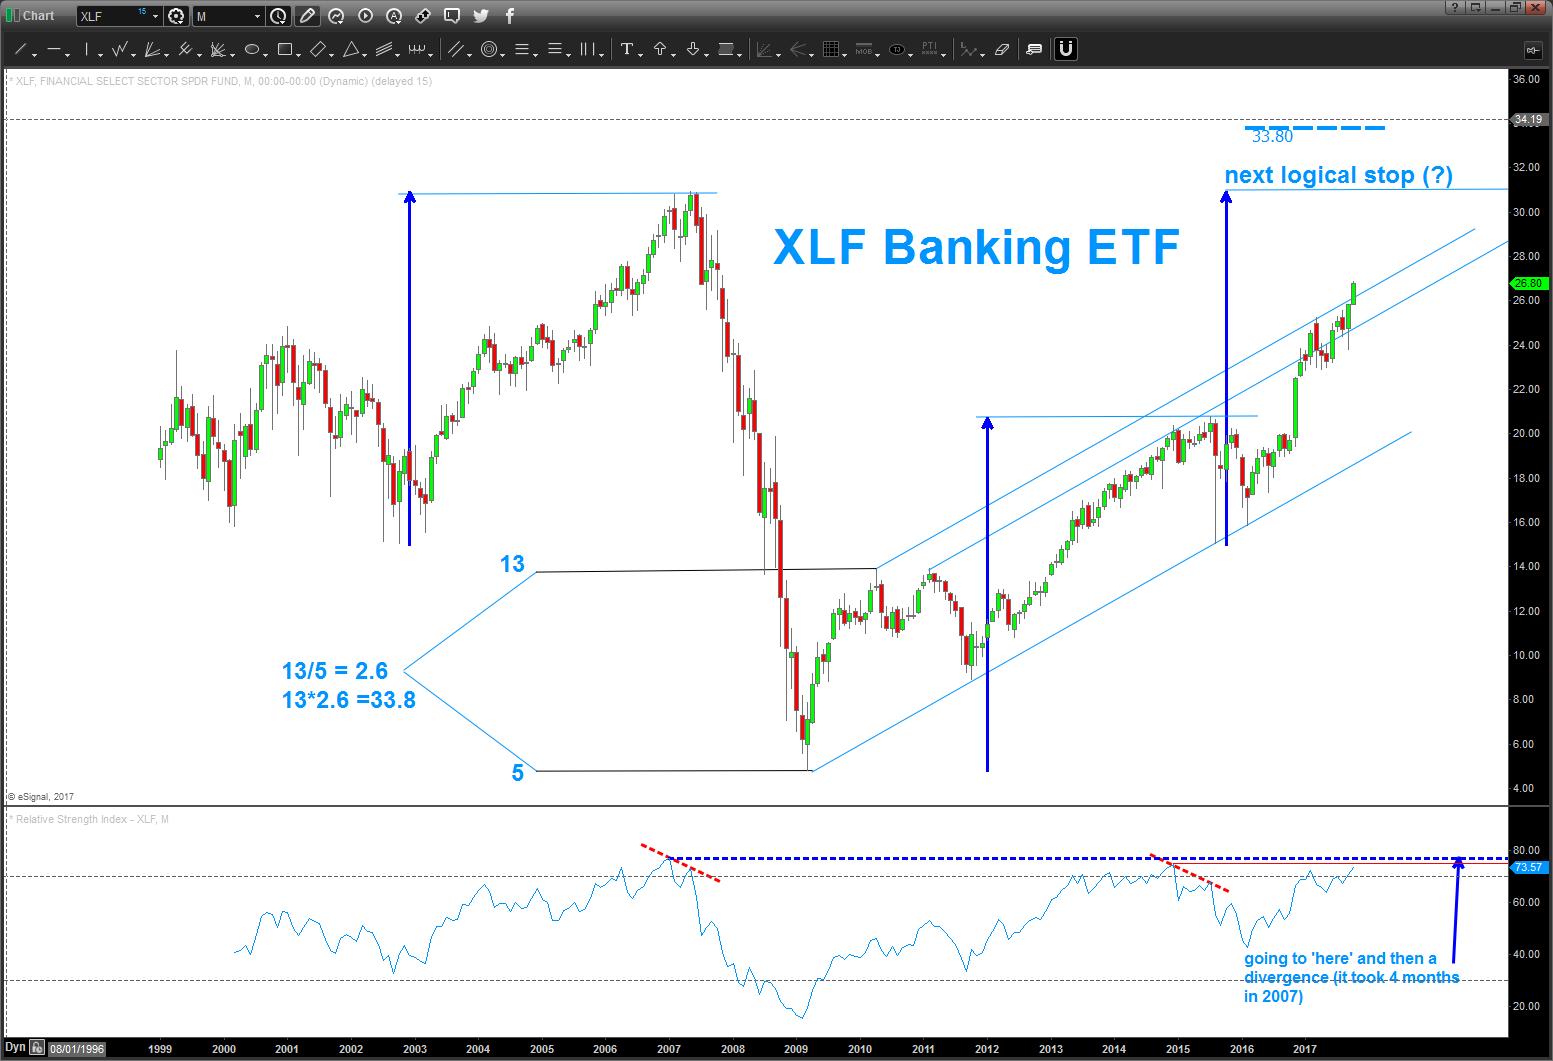 xlf financial bank stocks sector etf bull market price target